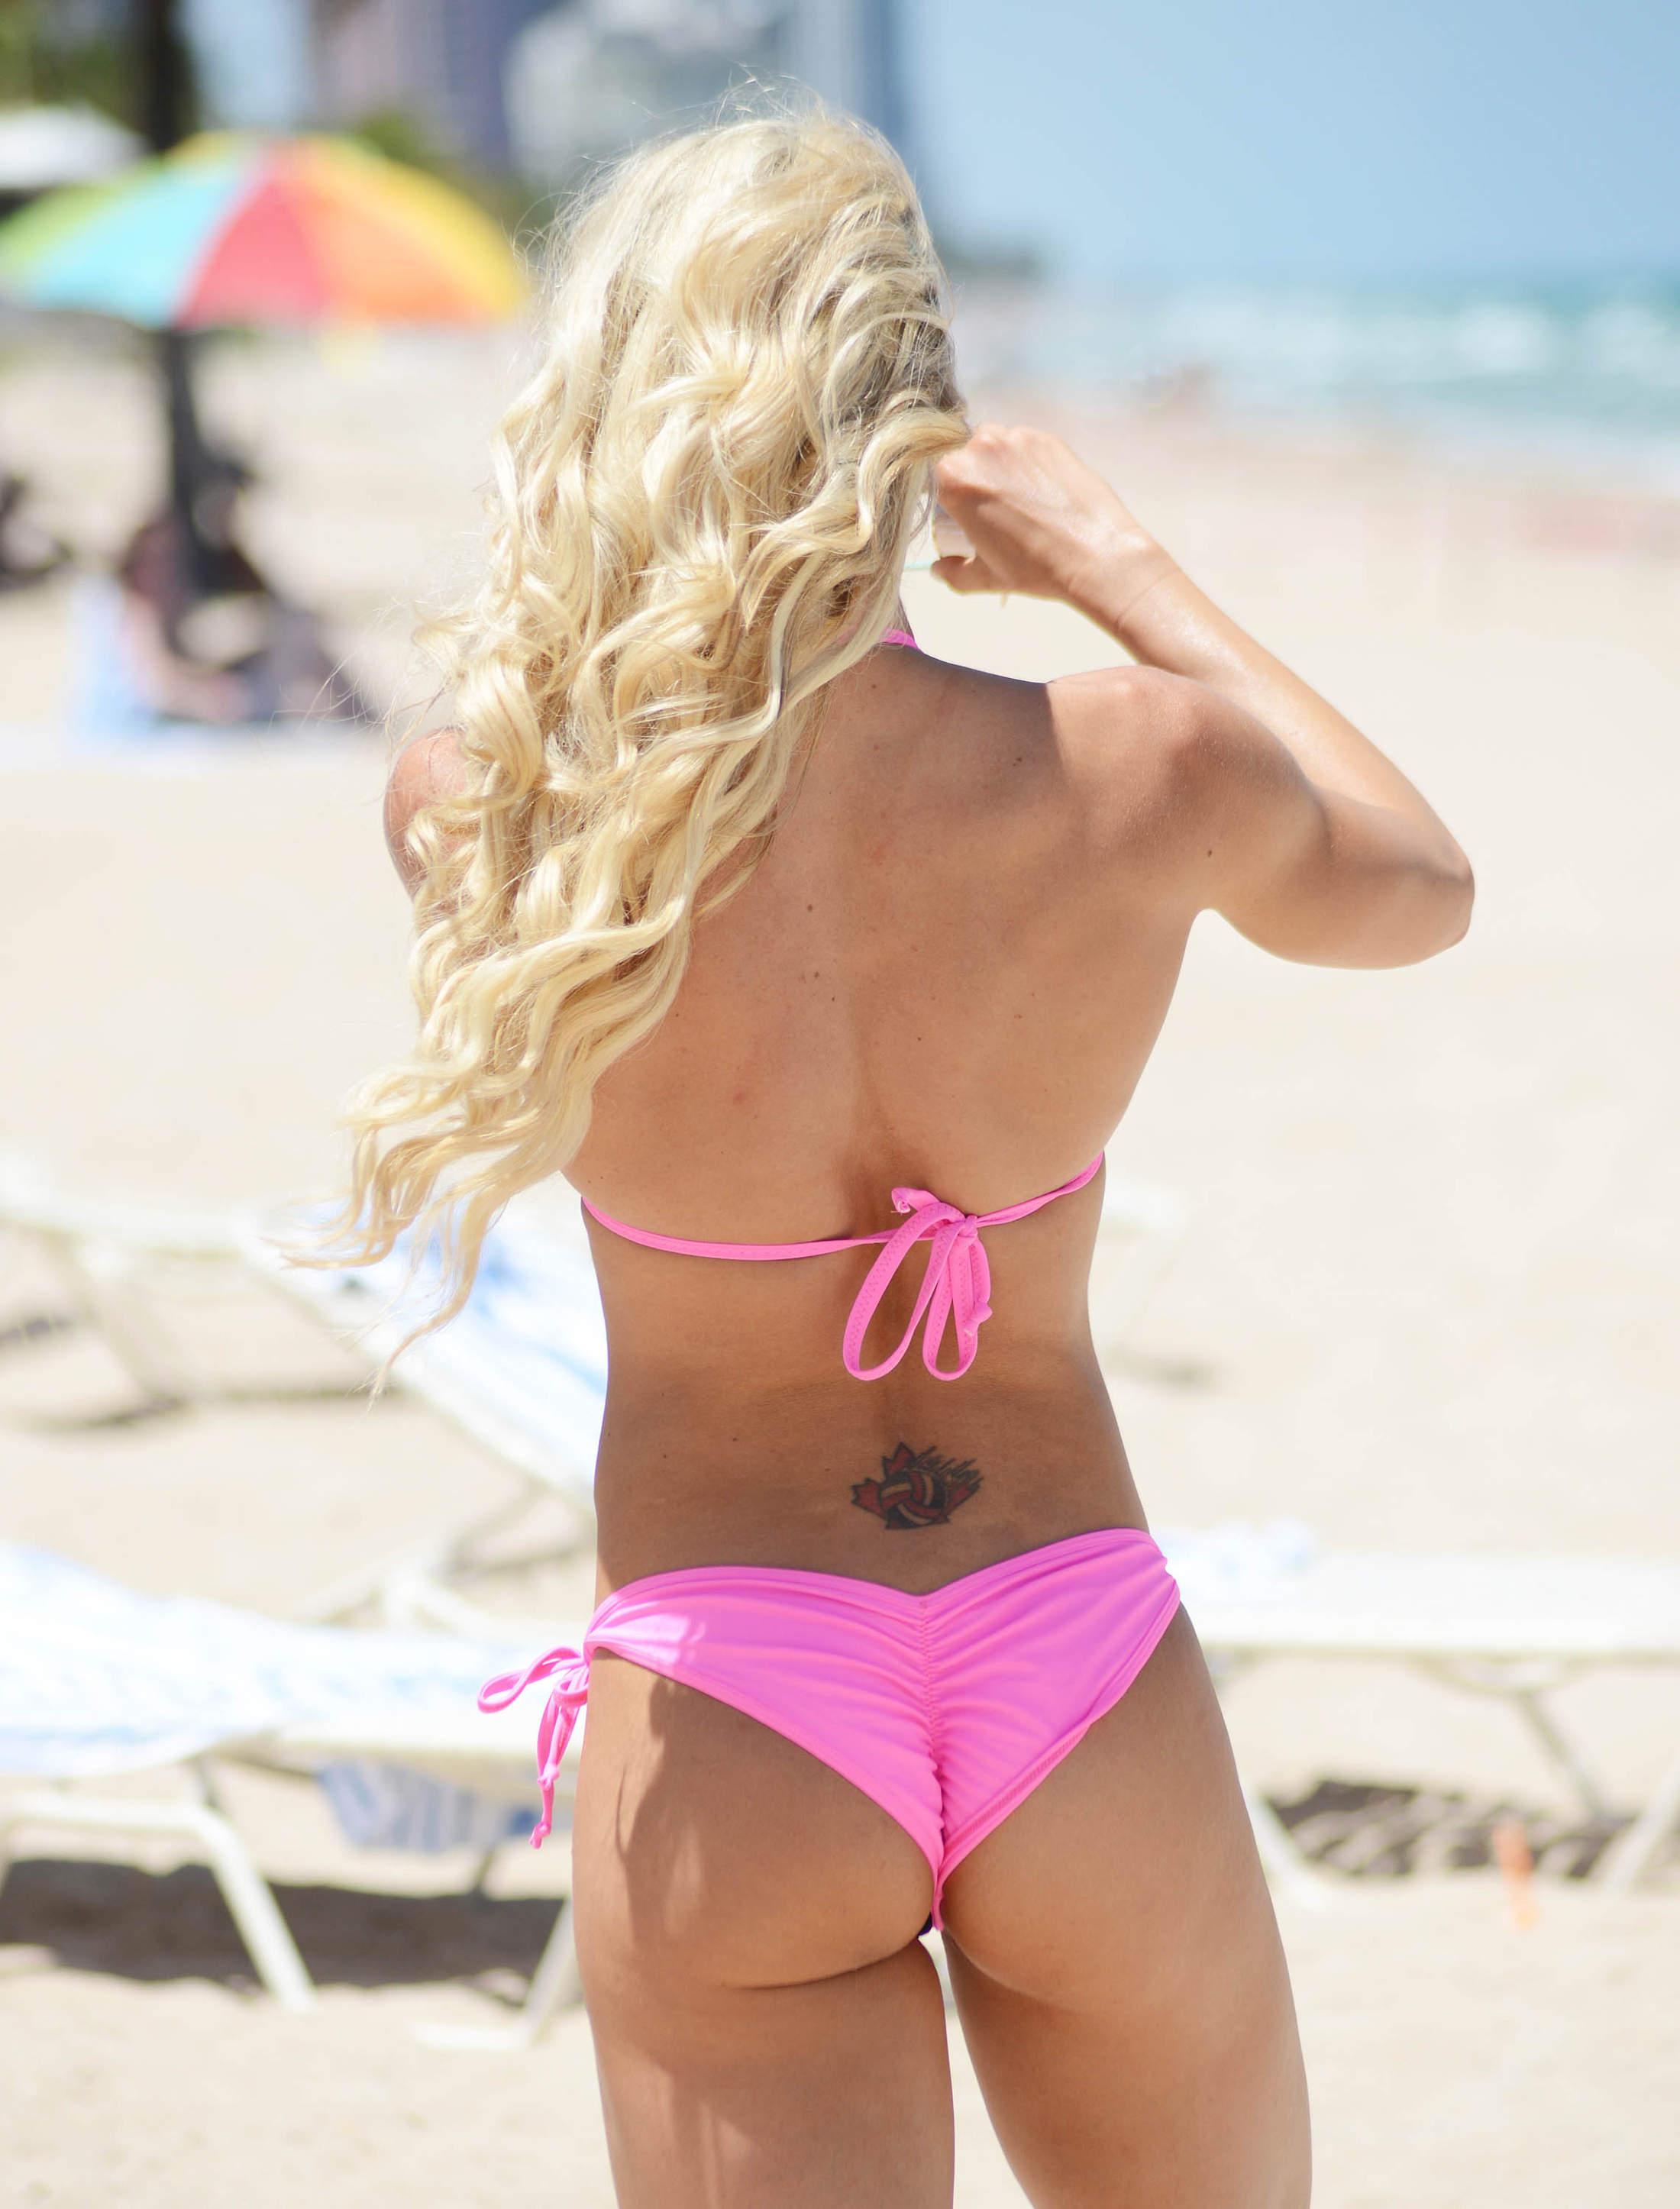 Jill Bunny Shows Her Bikini Body Miami